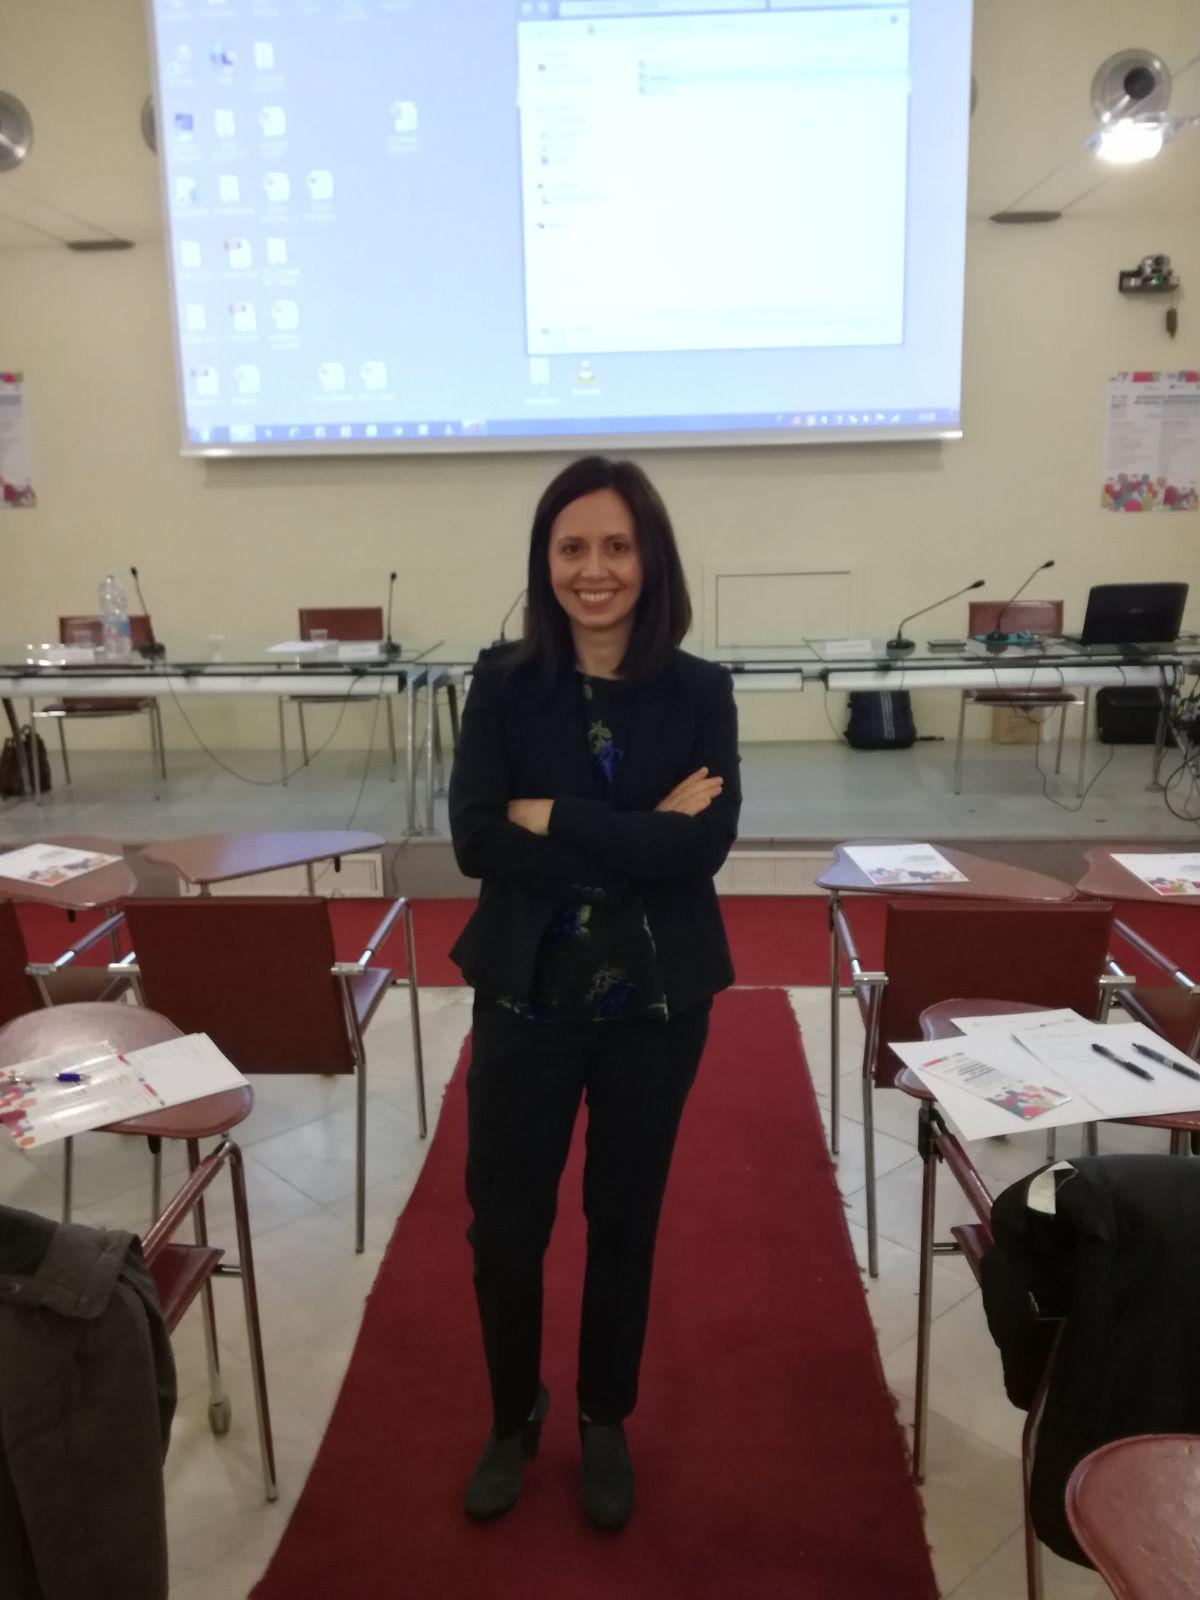 Anna Serena VERGORI